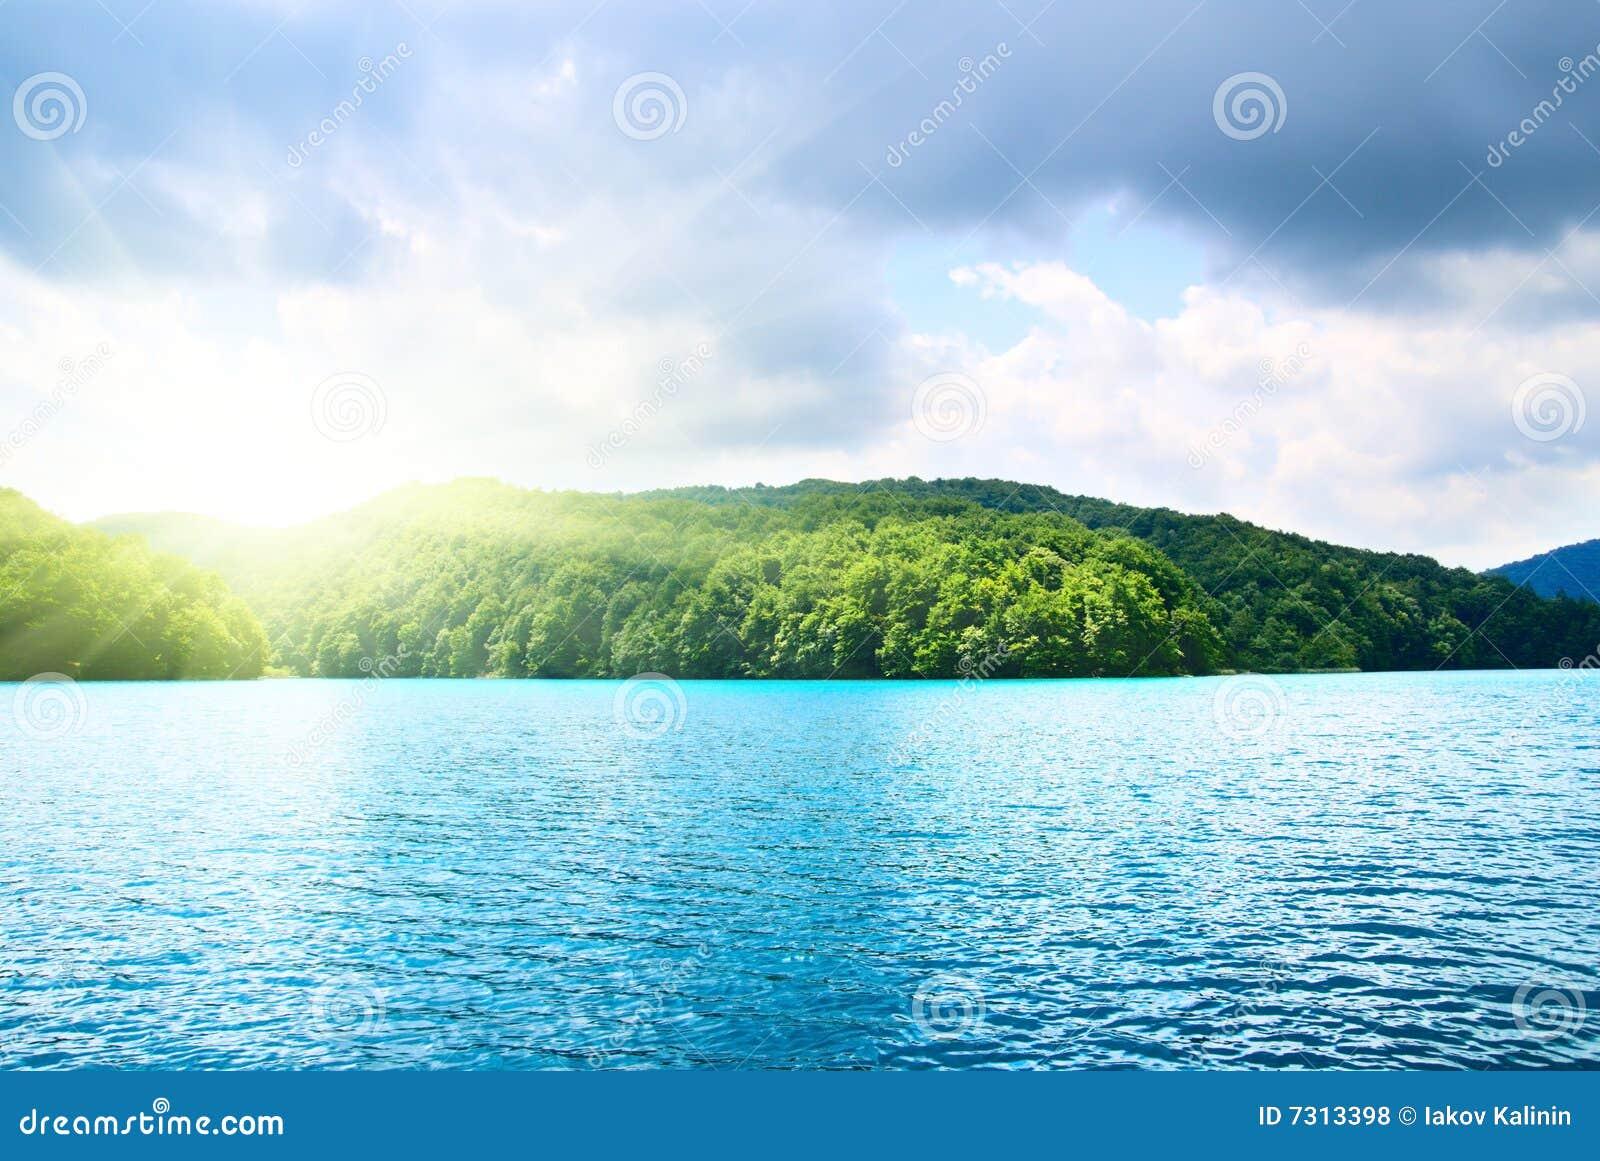 Lago in foresta